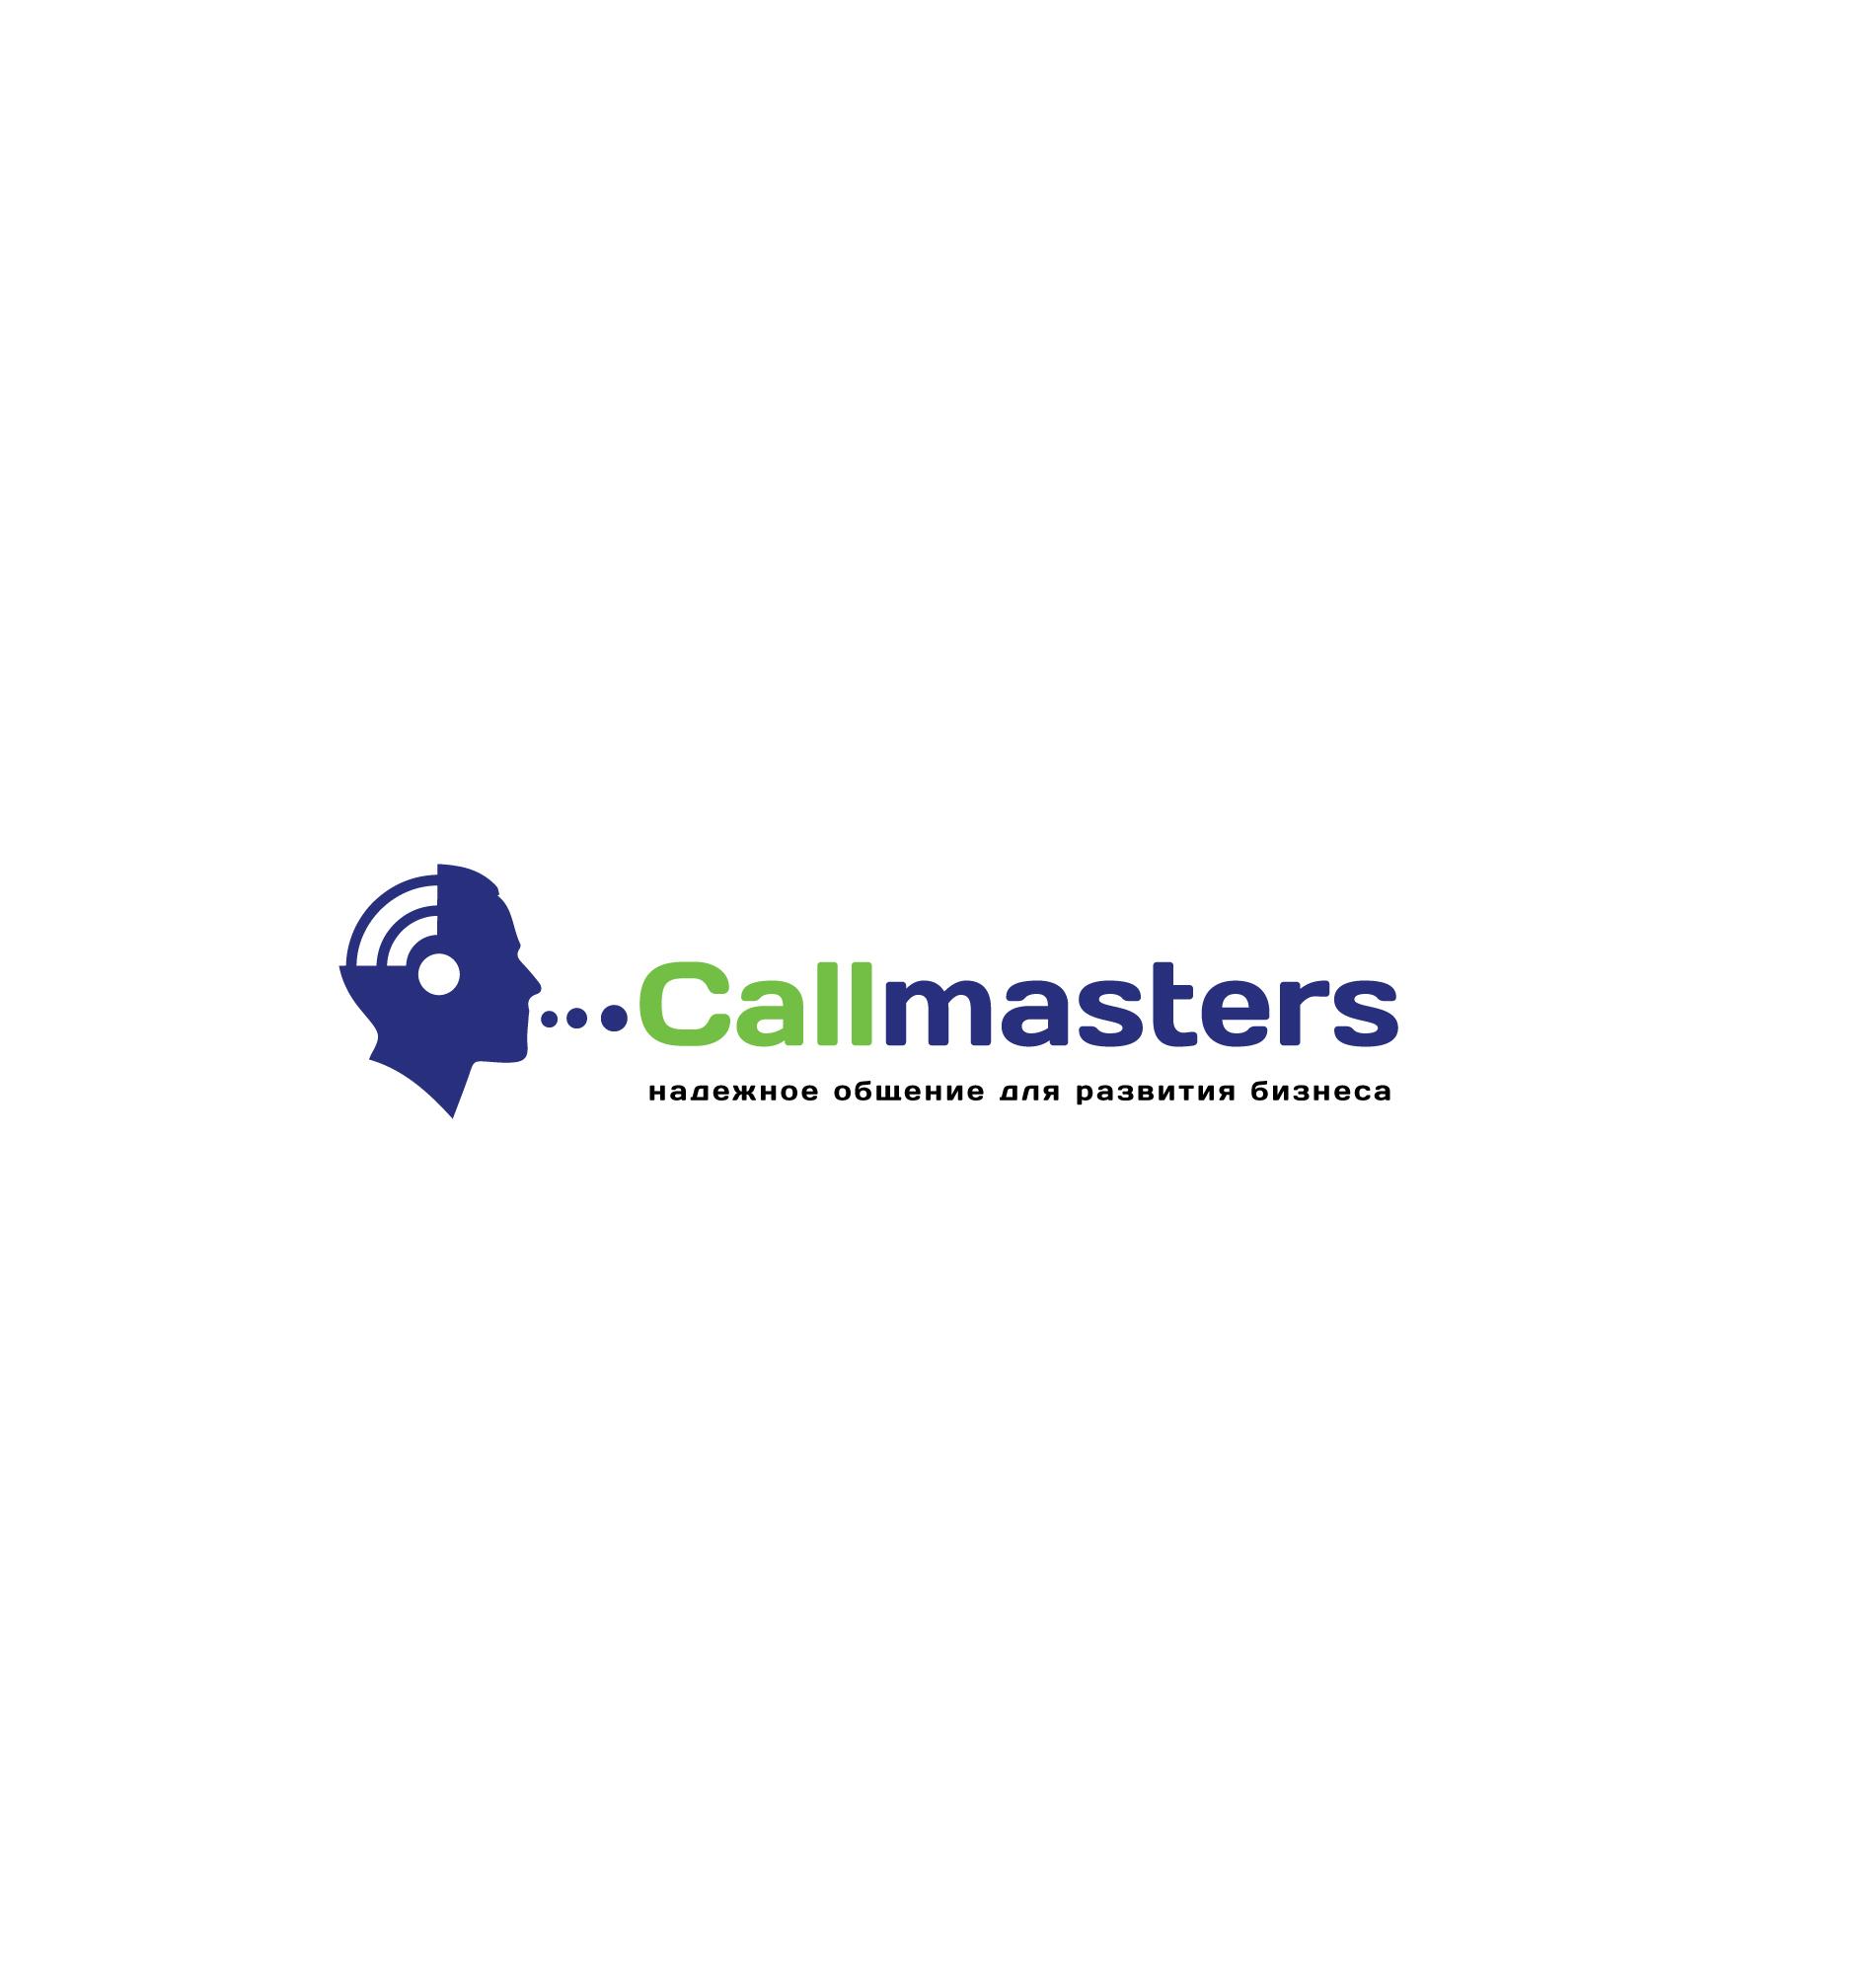 Логотип call-центра Callmasters  фото f_2855b6a286692b5a.jpg